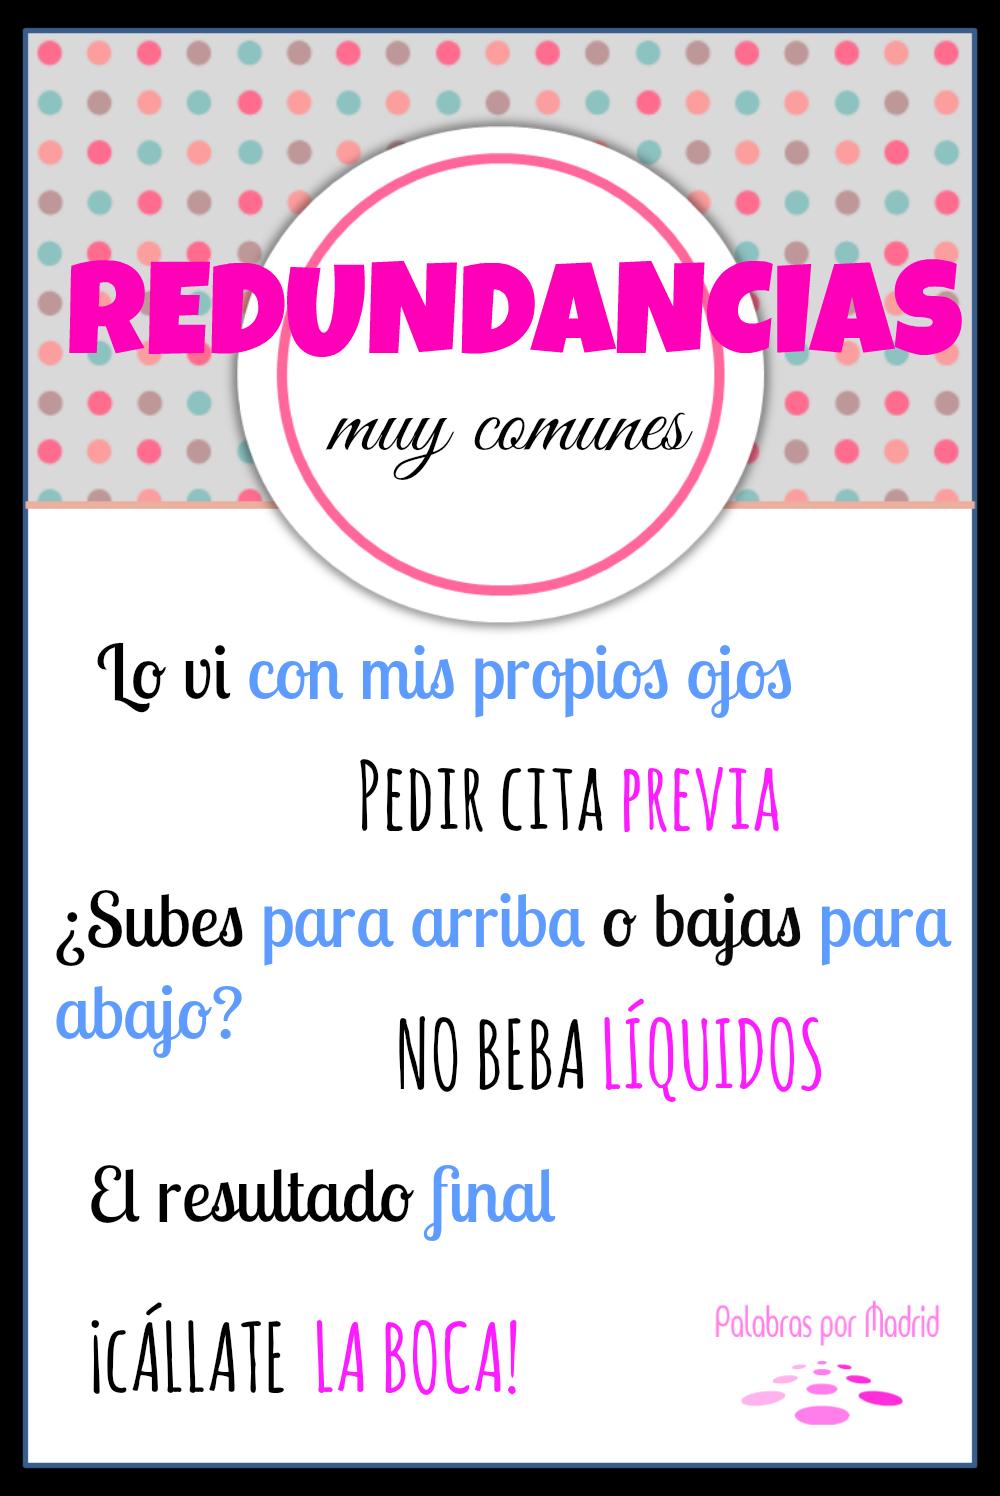 Cállate La Boca Ortografía Aprender Español Aprender Ortografia